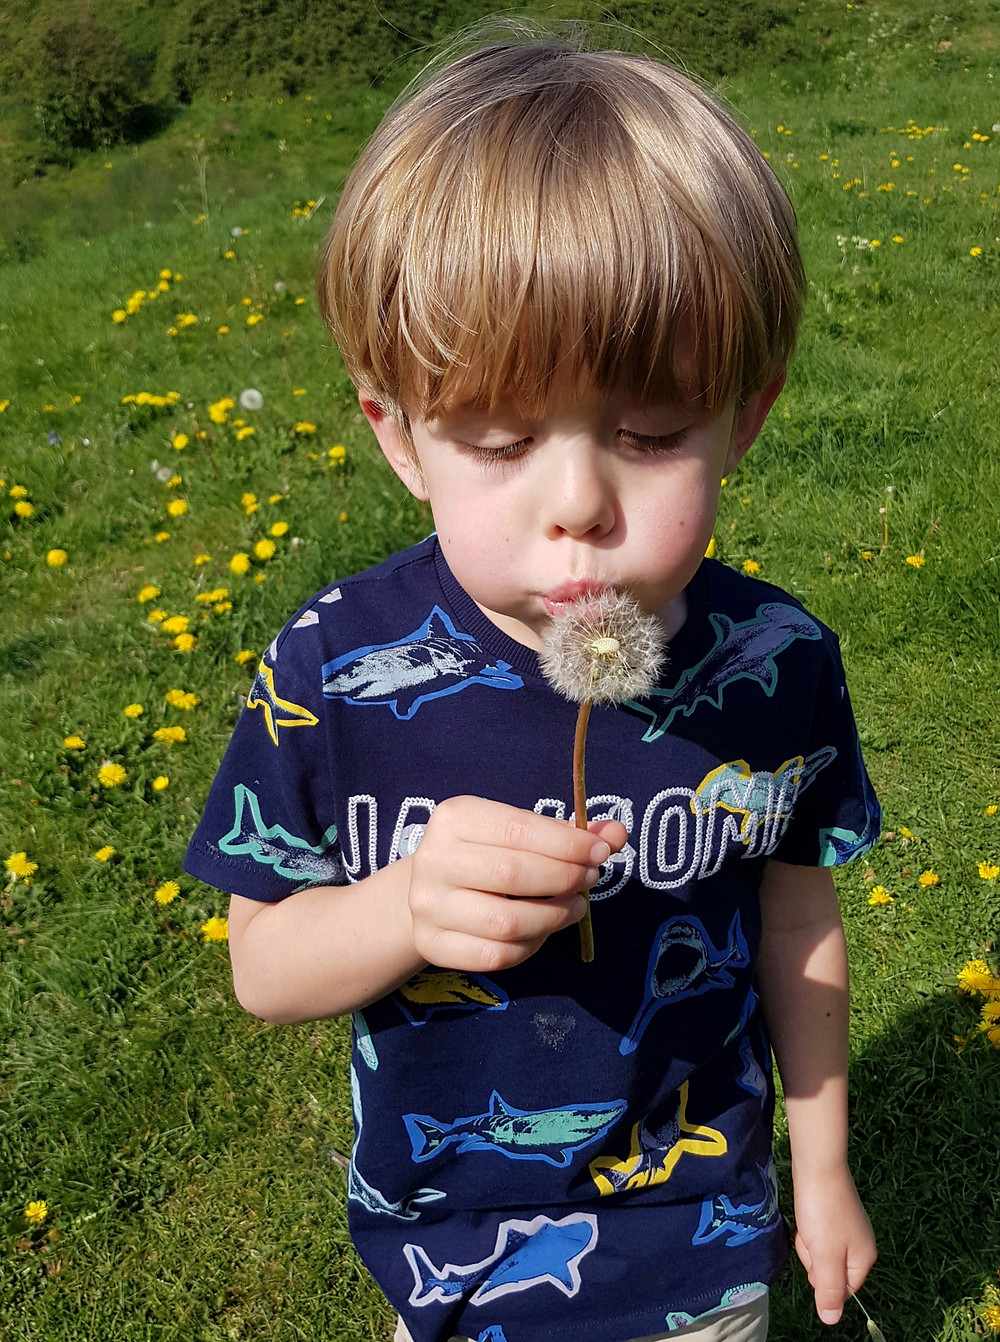 Child outdoors blowing dandelion clock